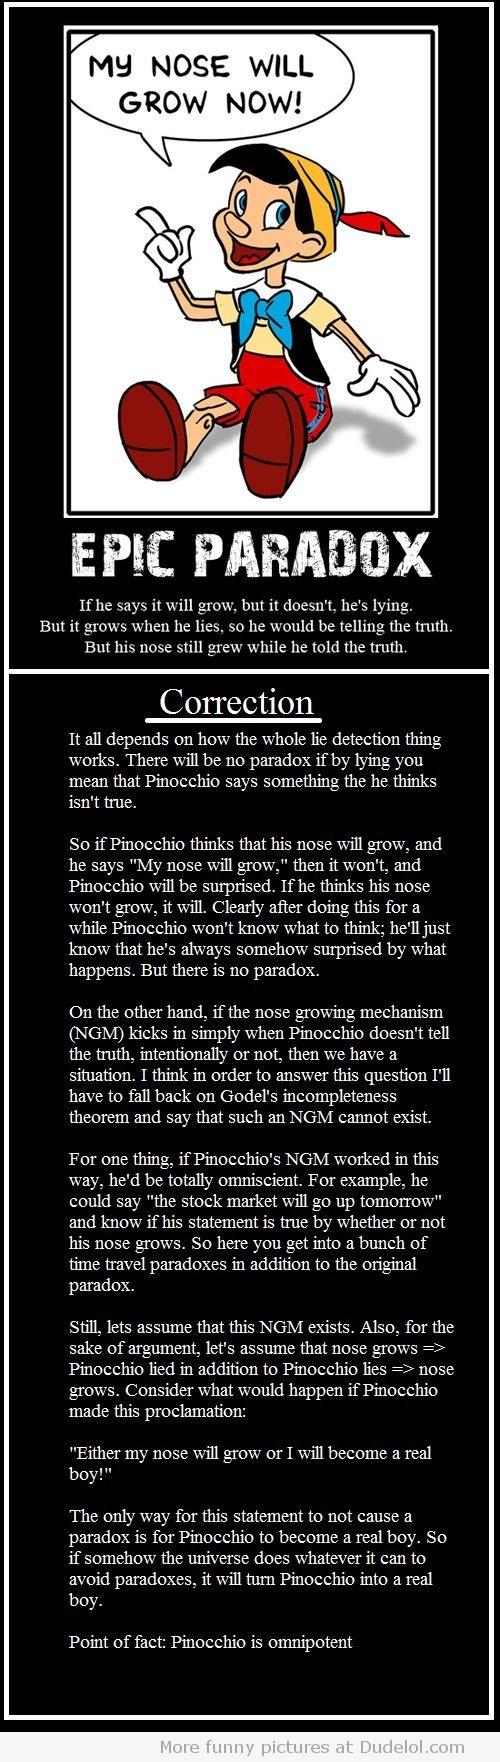 Pinocchio paradox solved